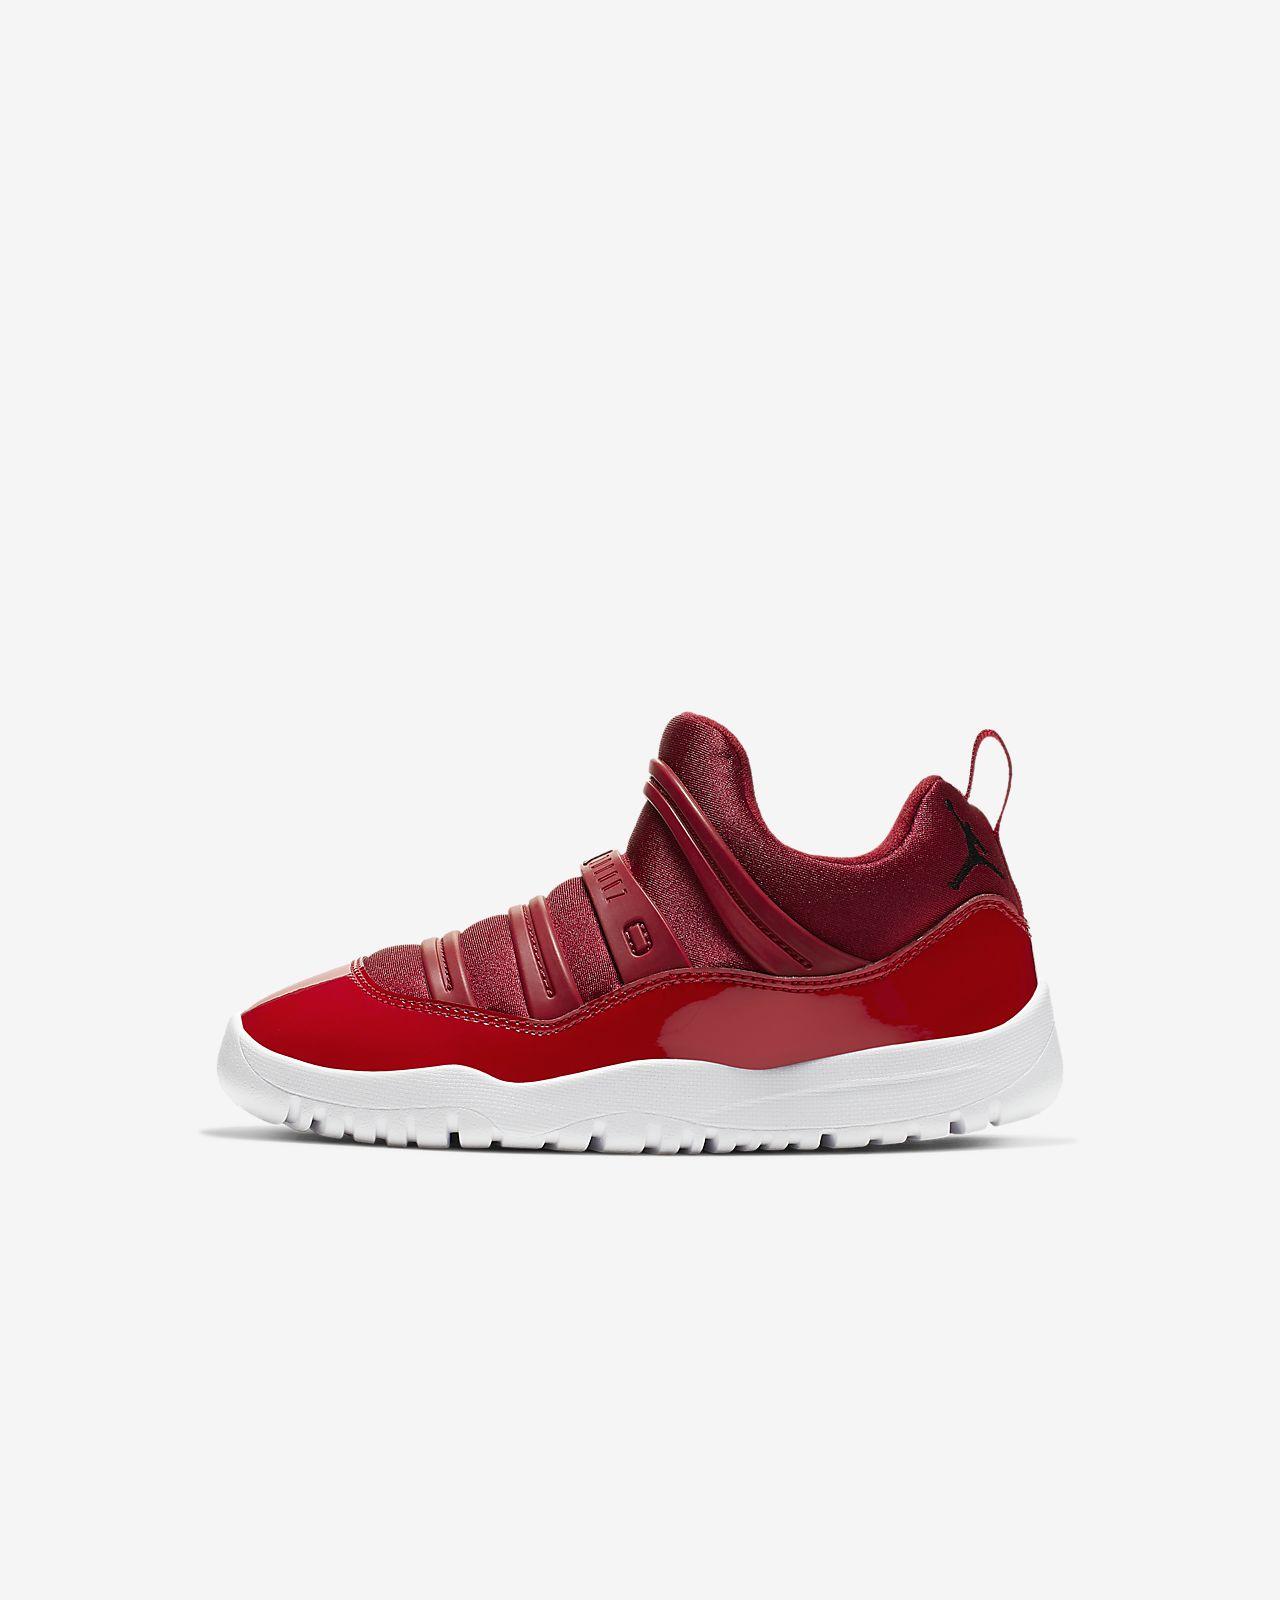 Jordan 11 Retro Little Flex 小童鞋款